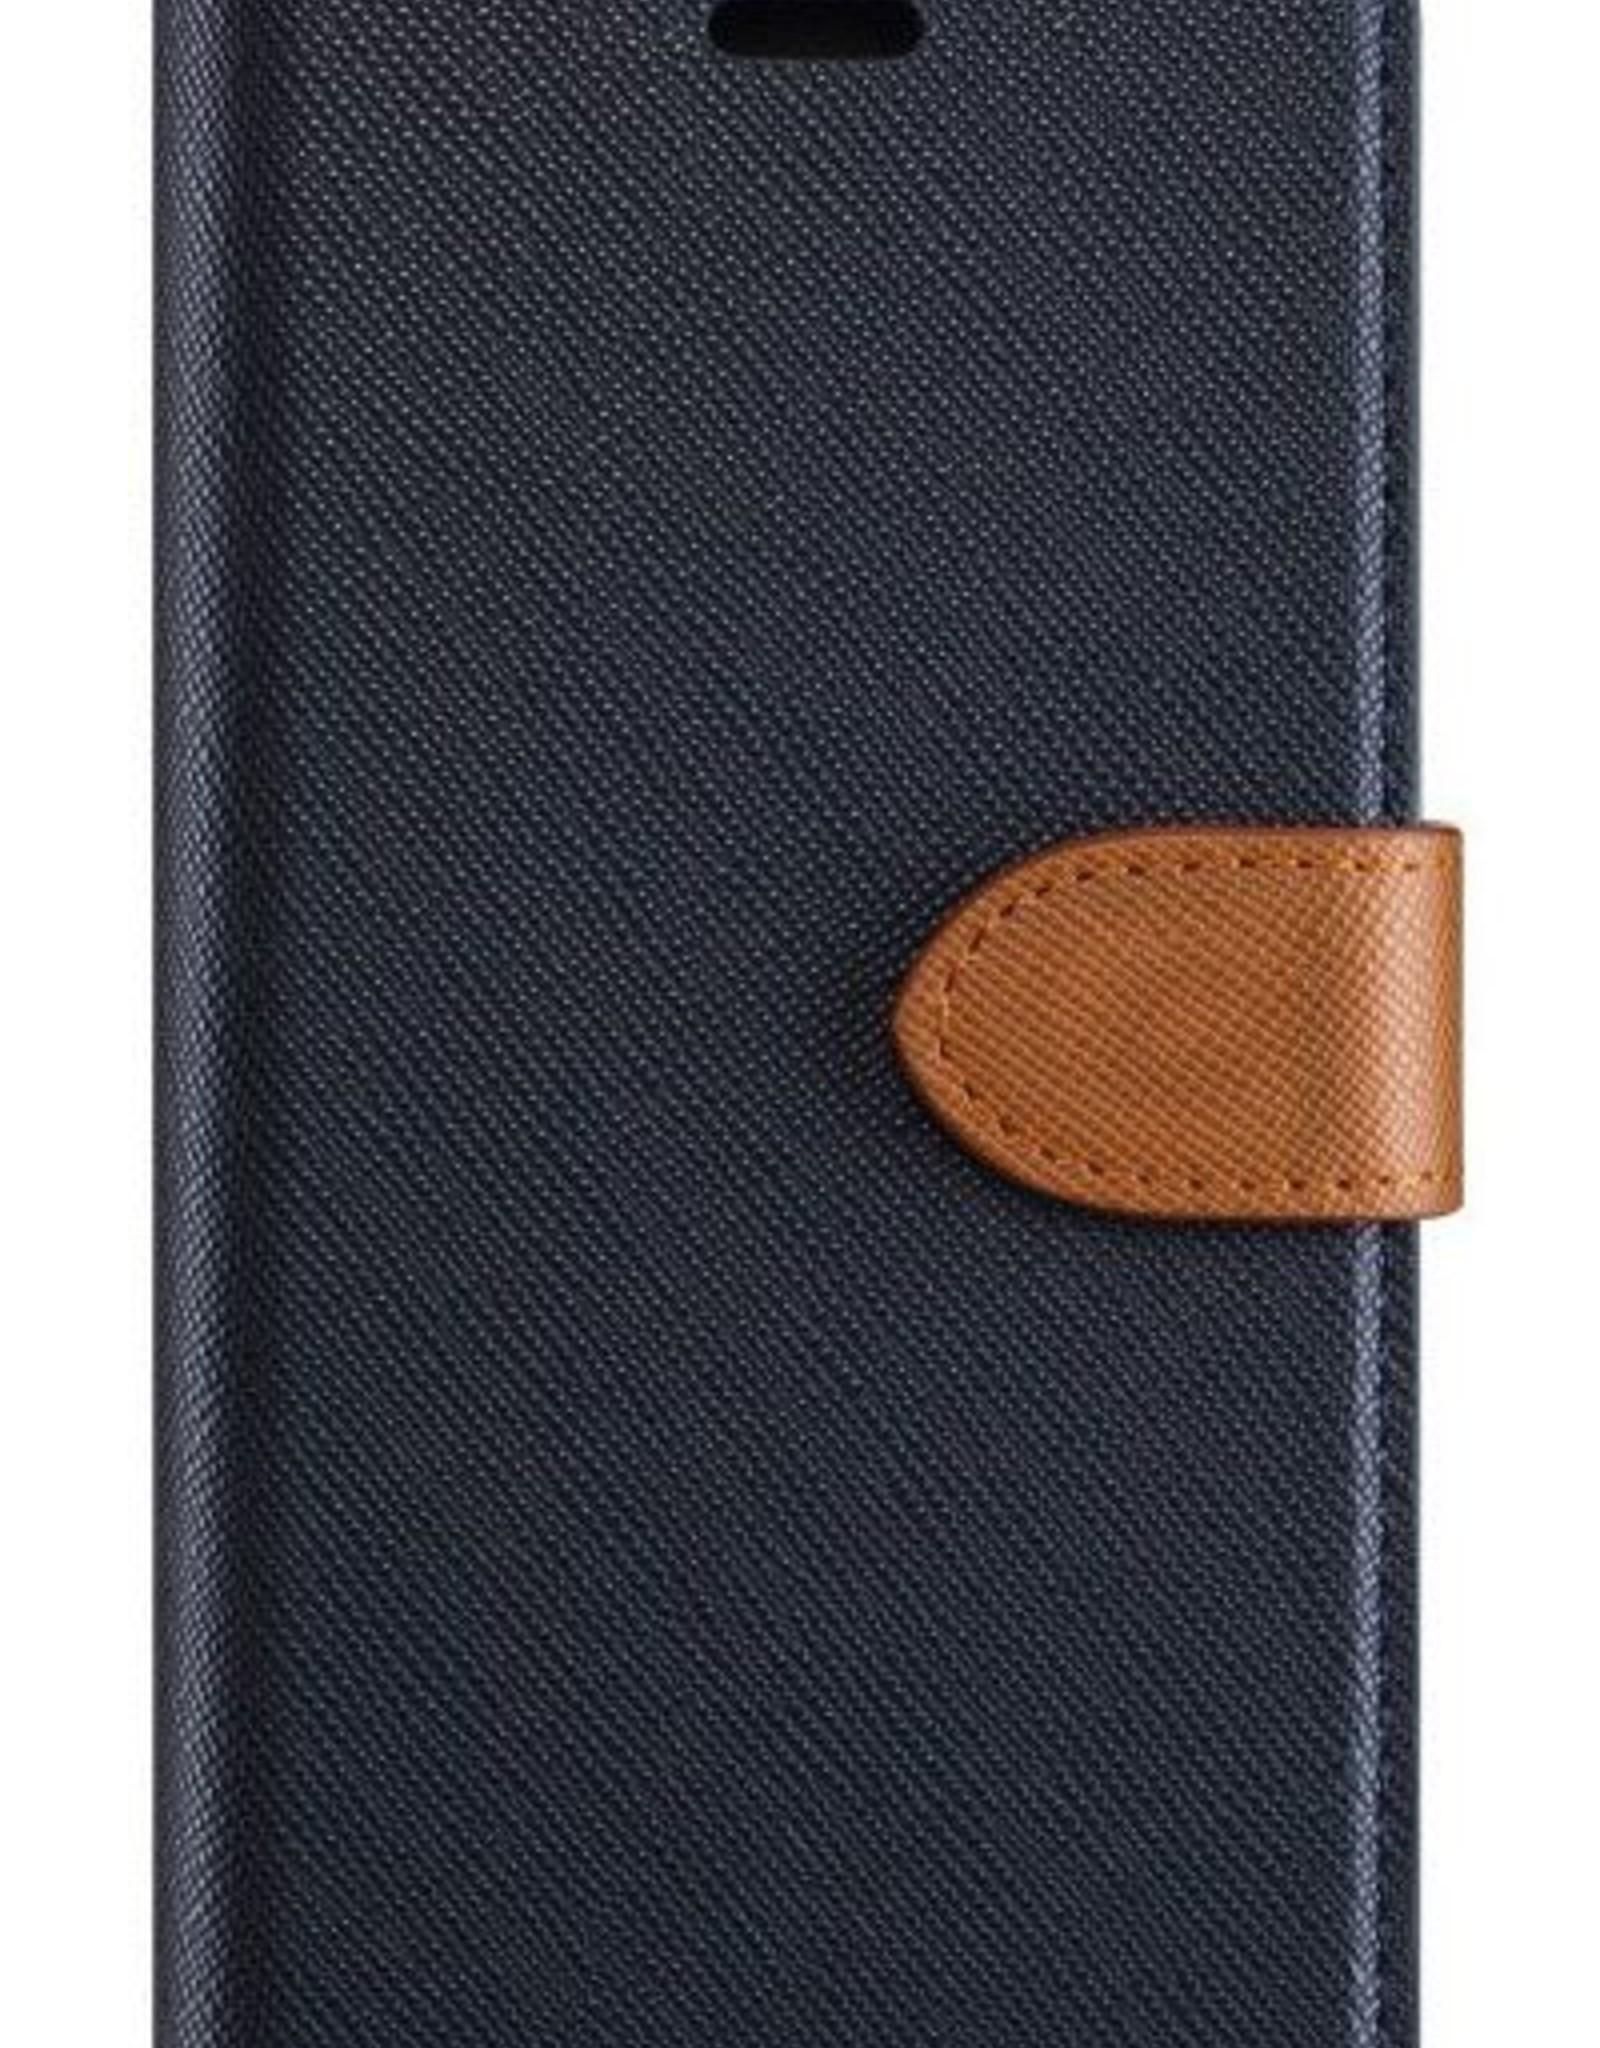 Blu Element Blu Element  Samsung Galaxy S8   2 in 1 Folio Blue/Tan - 112-9000